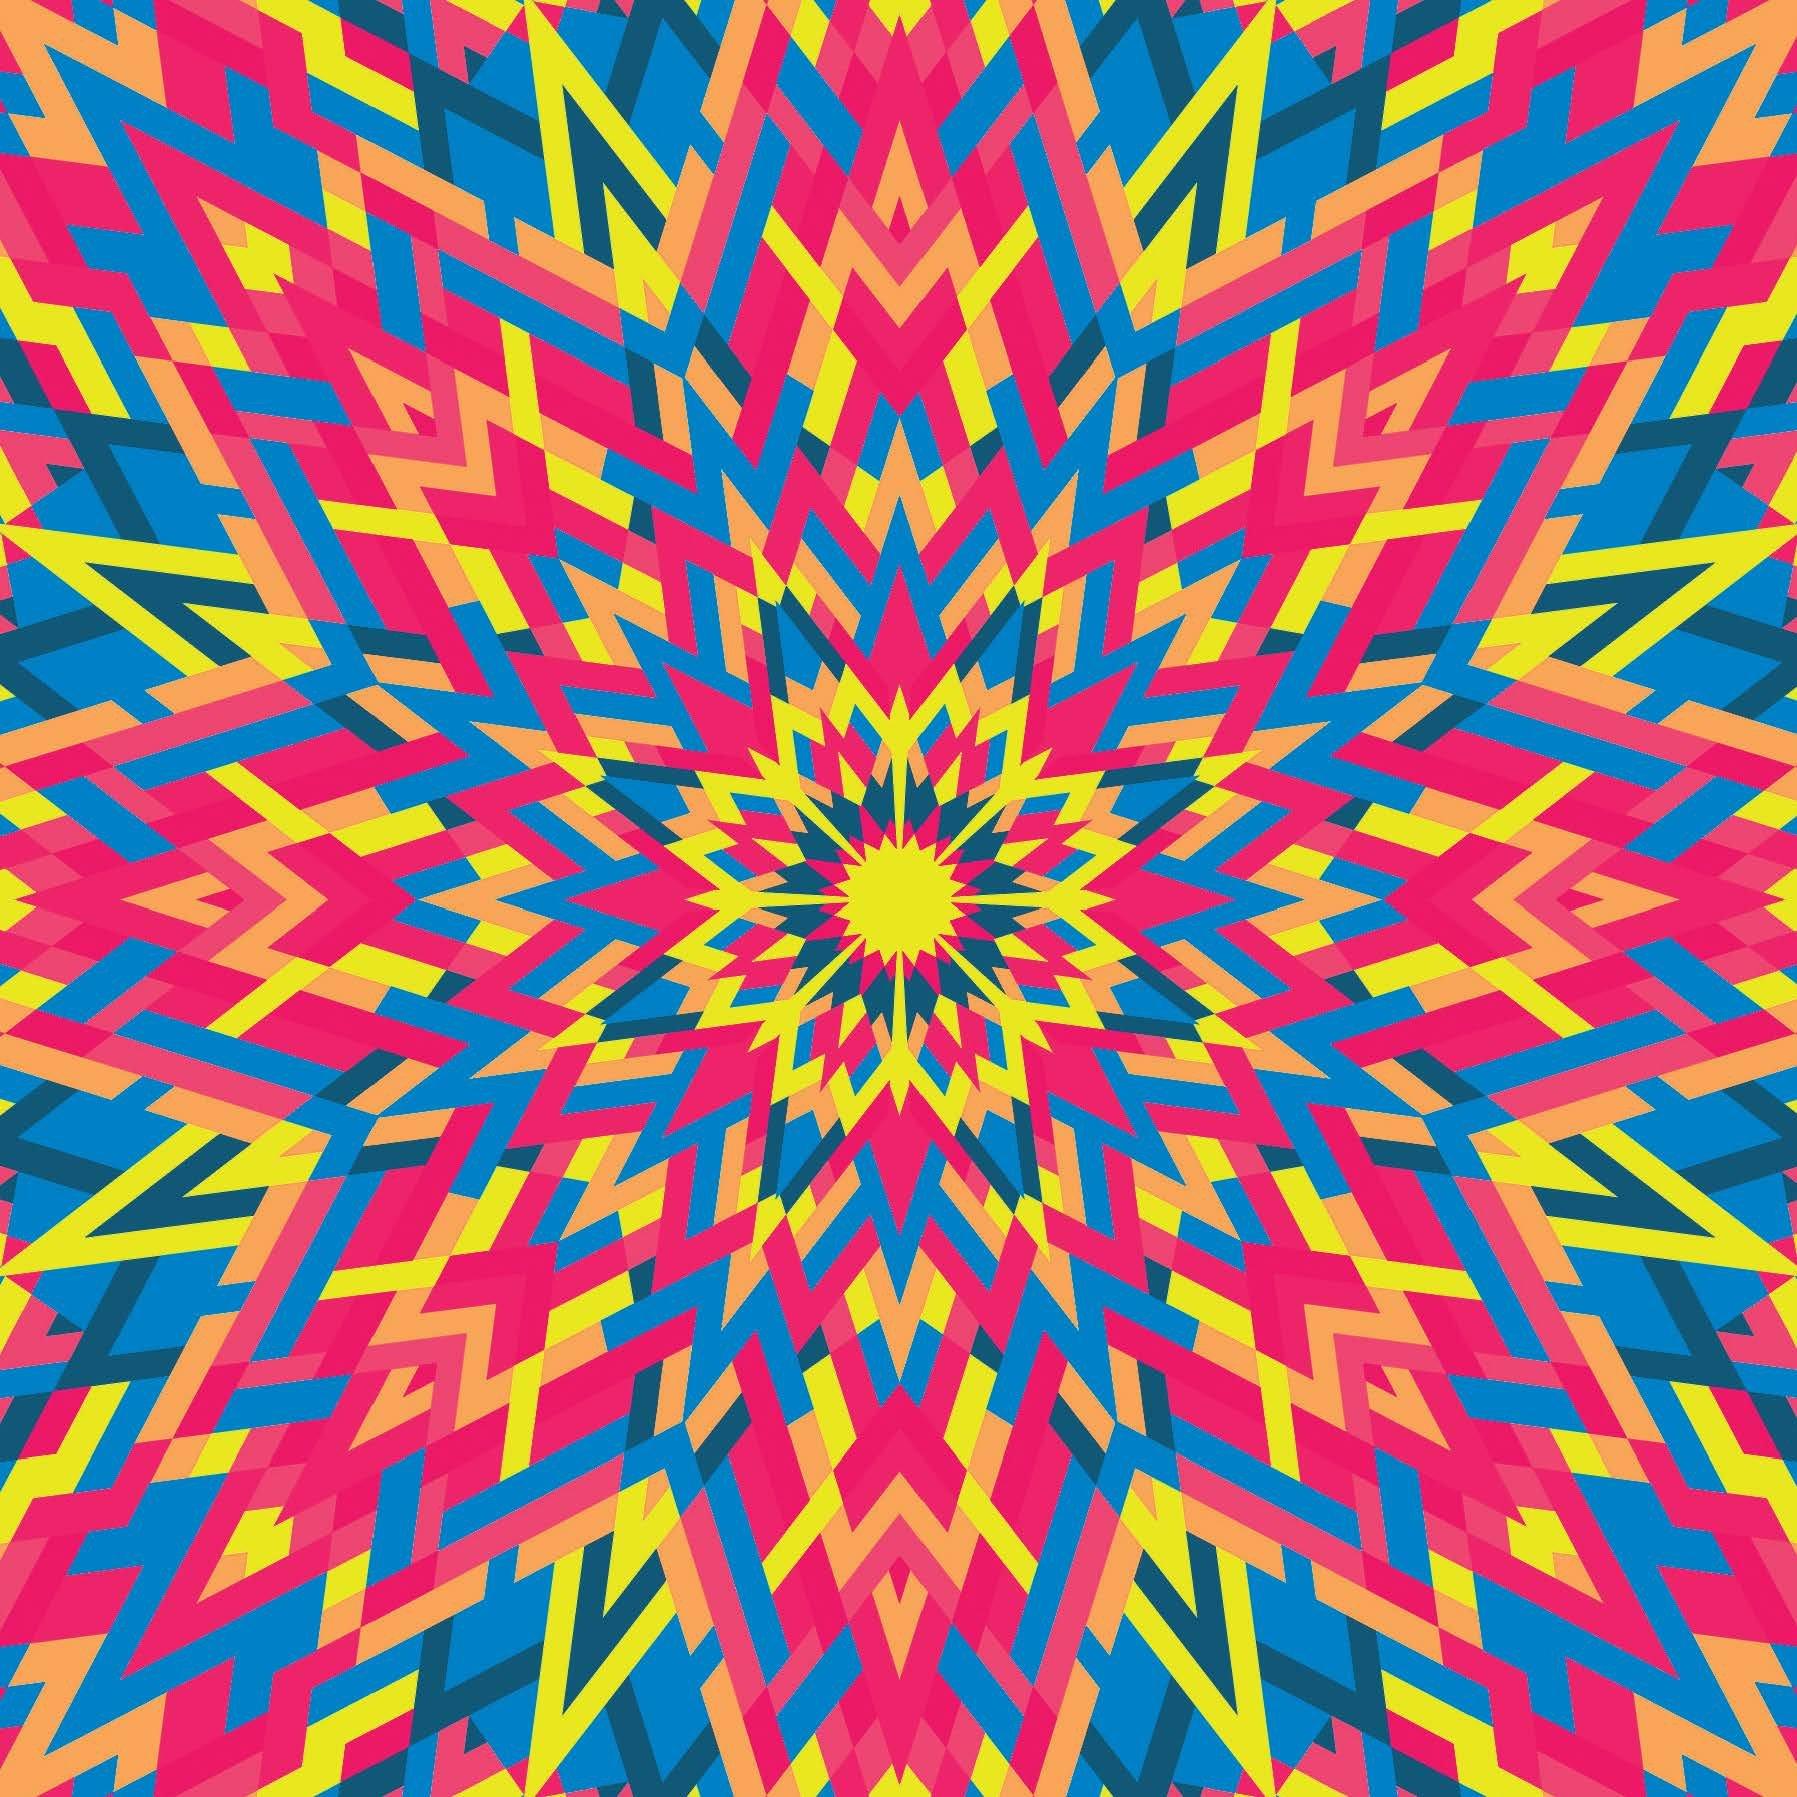 Kaleidoscope Patterns Interesting Design Ideas